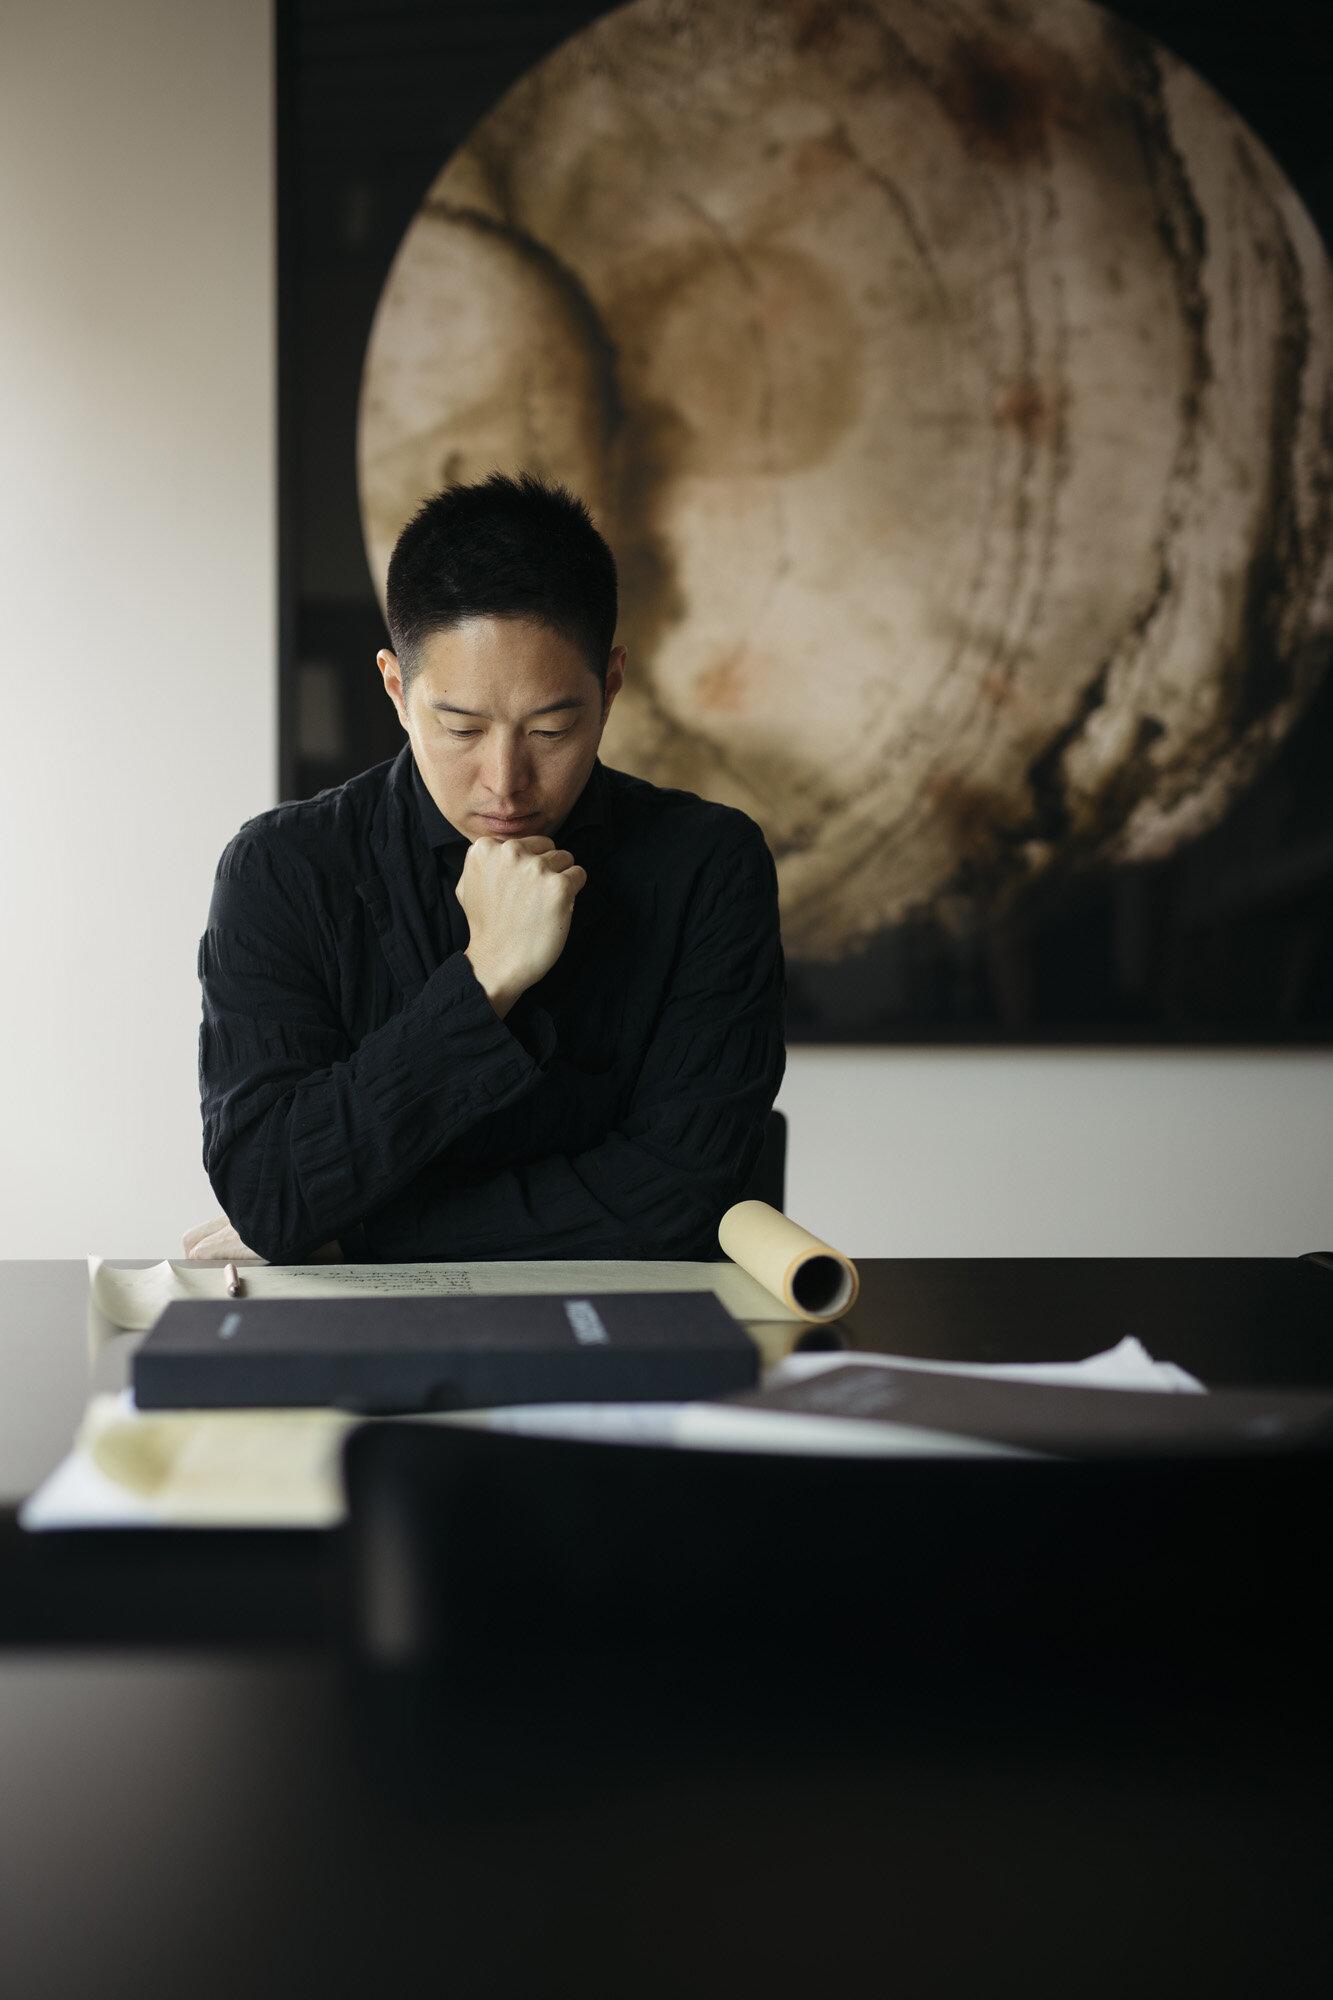 Brewin Design Office - Portraits - Bobby Cheng - 4.jpg